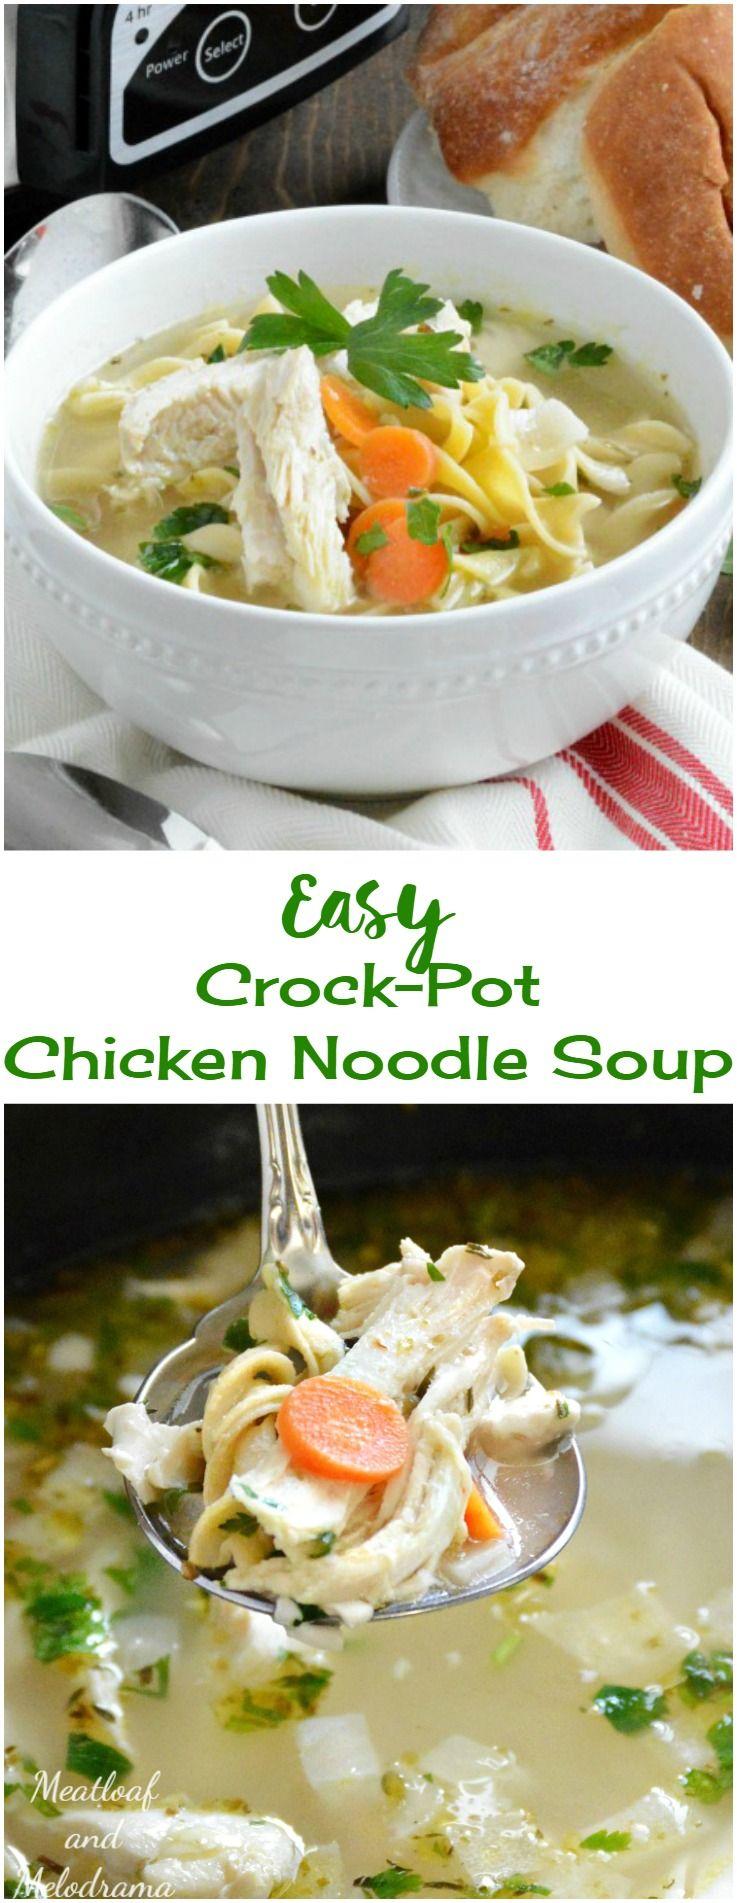 easy crockpot chicken noodle soup  recipe  slow cooker